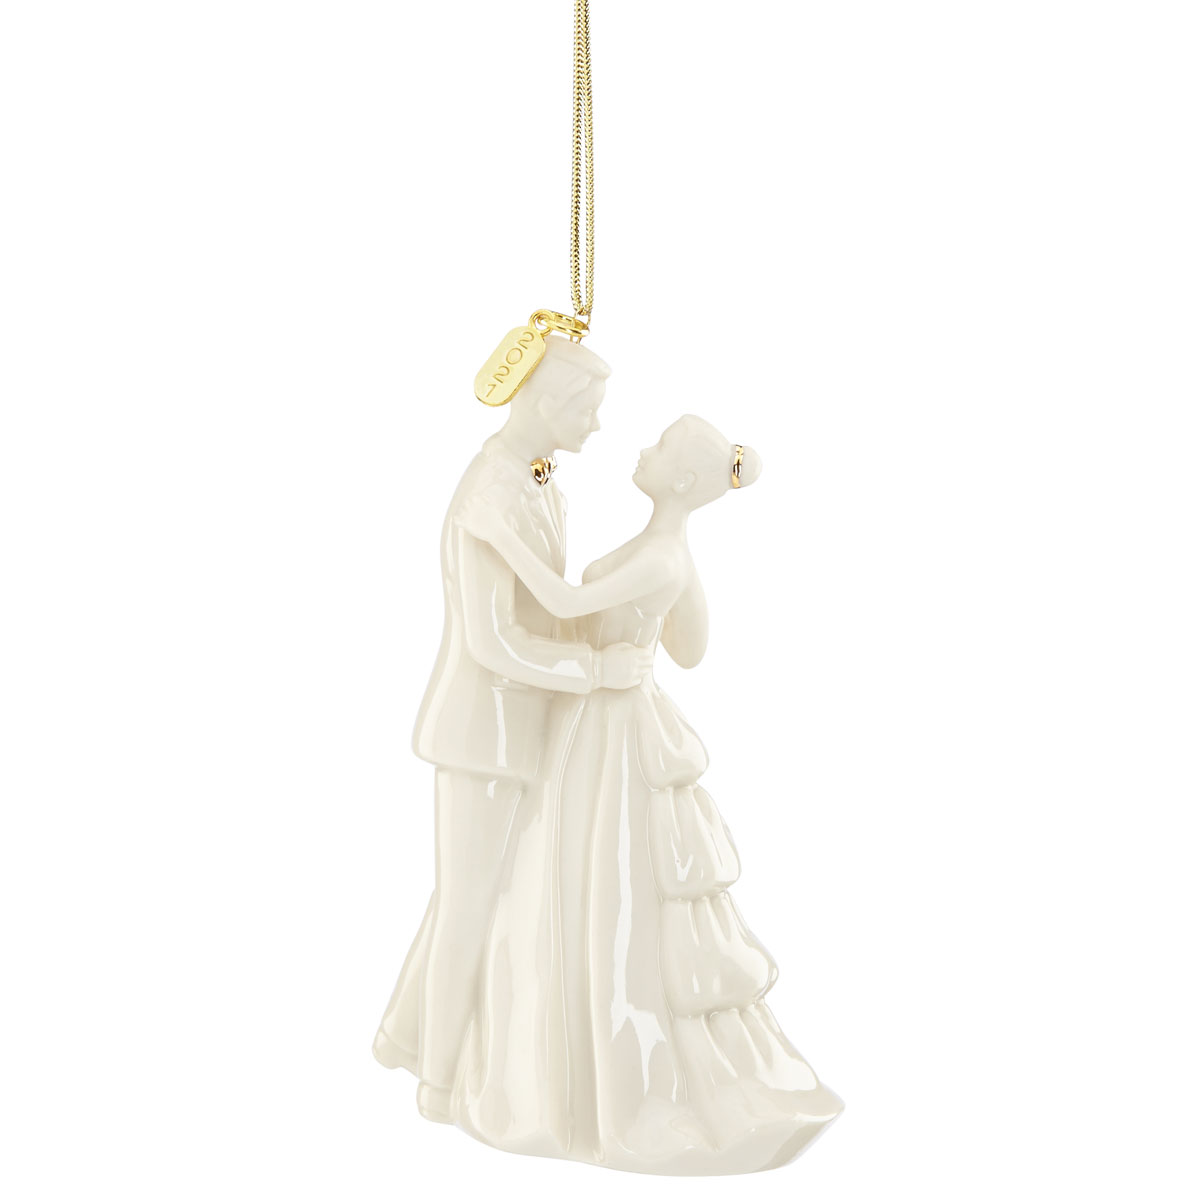 Lenox 2021 Bride and Groom Ornament